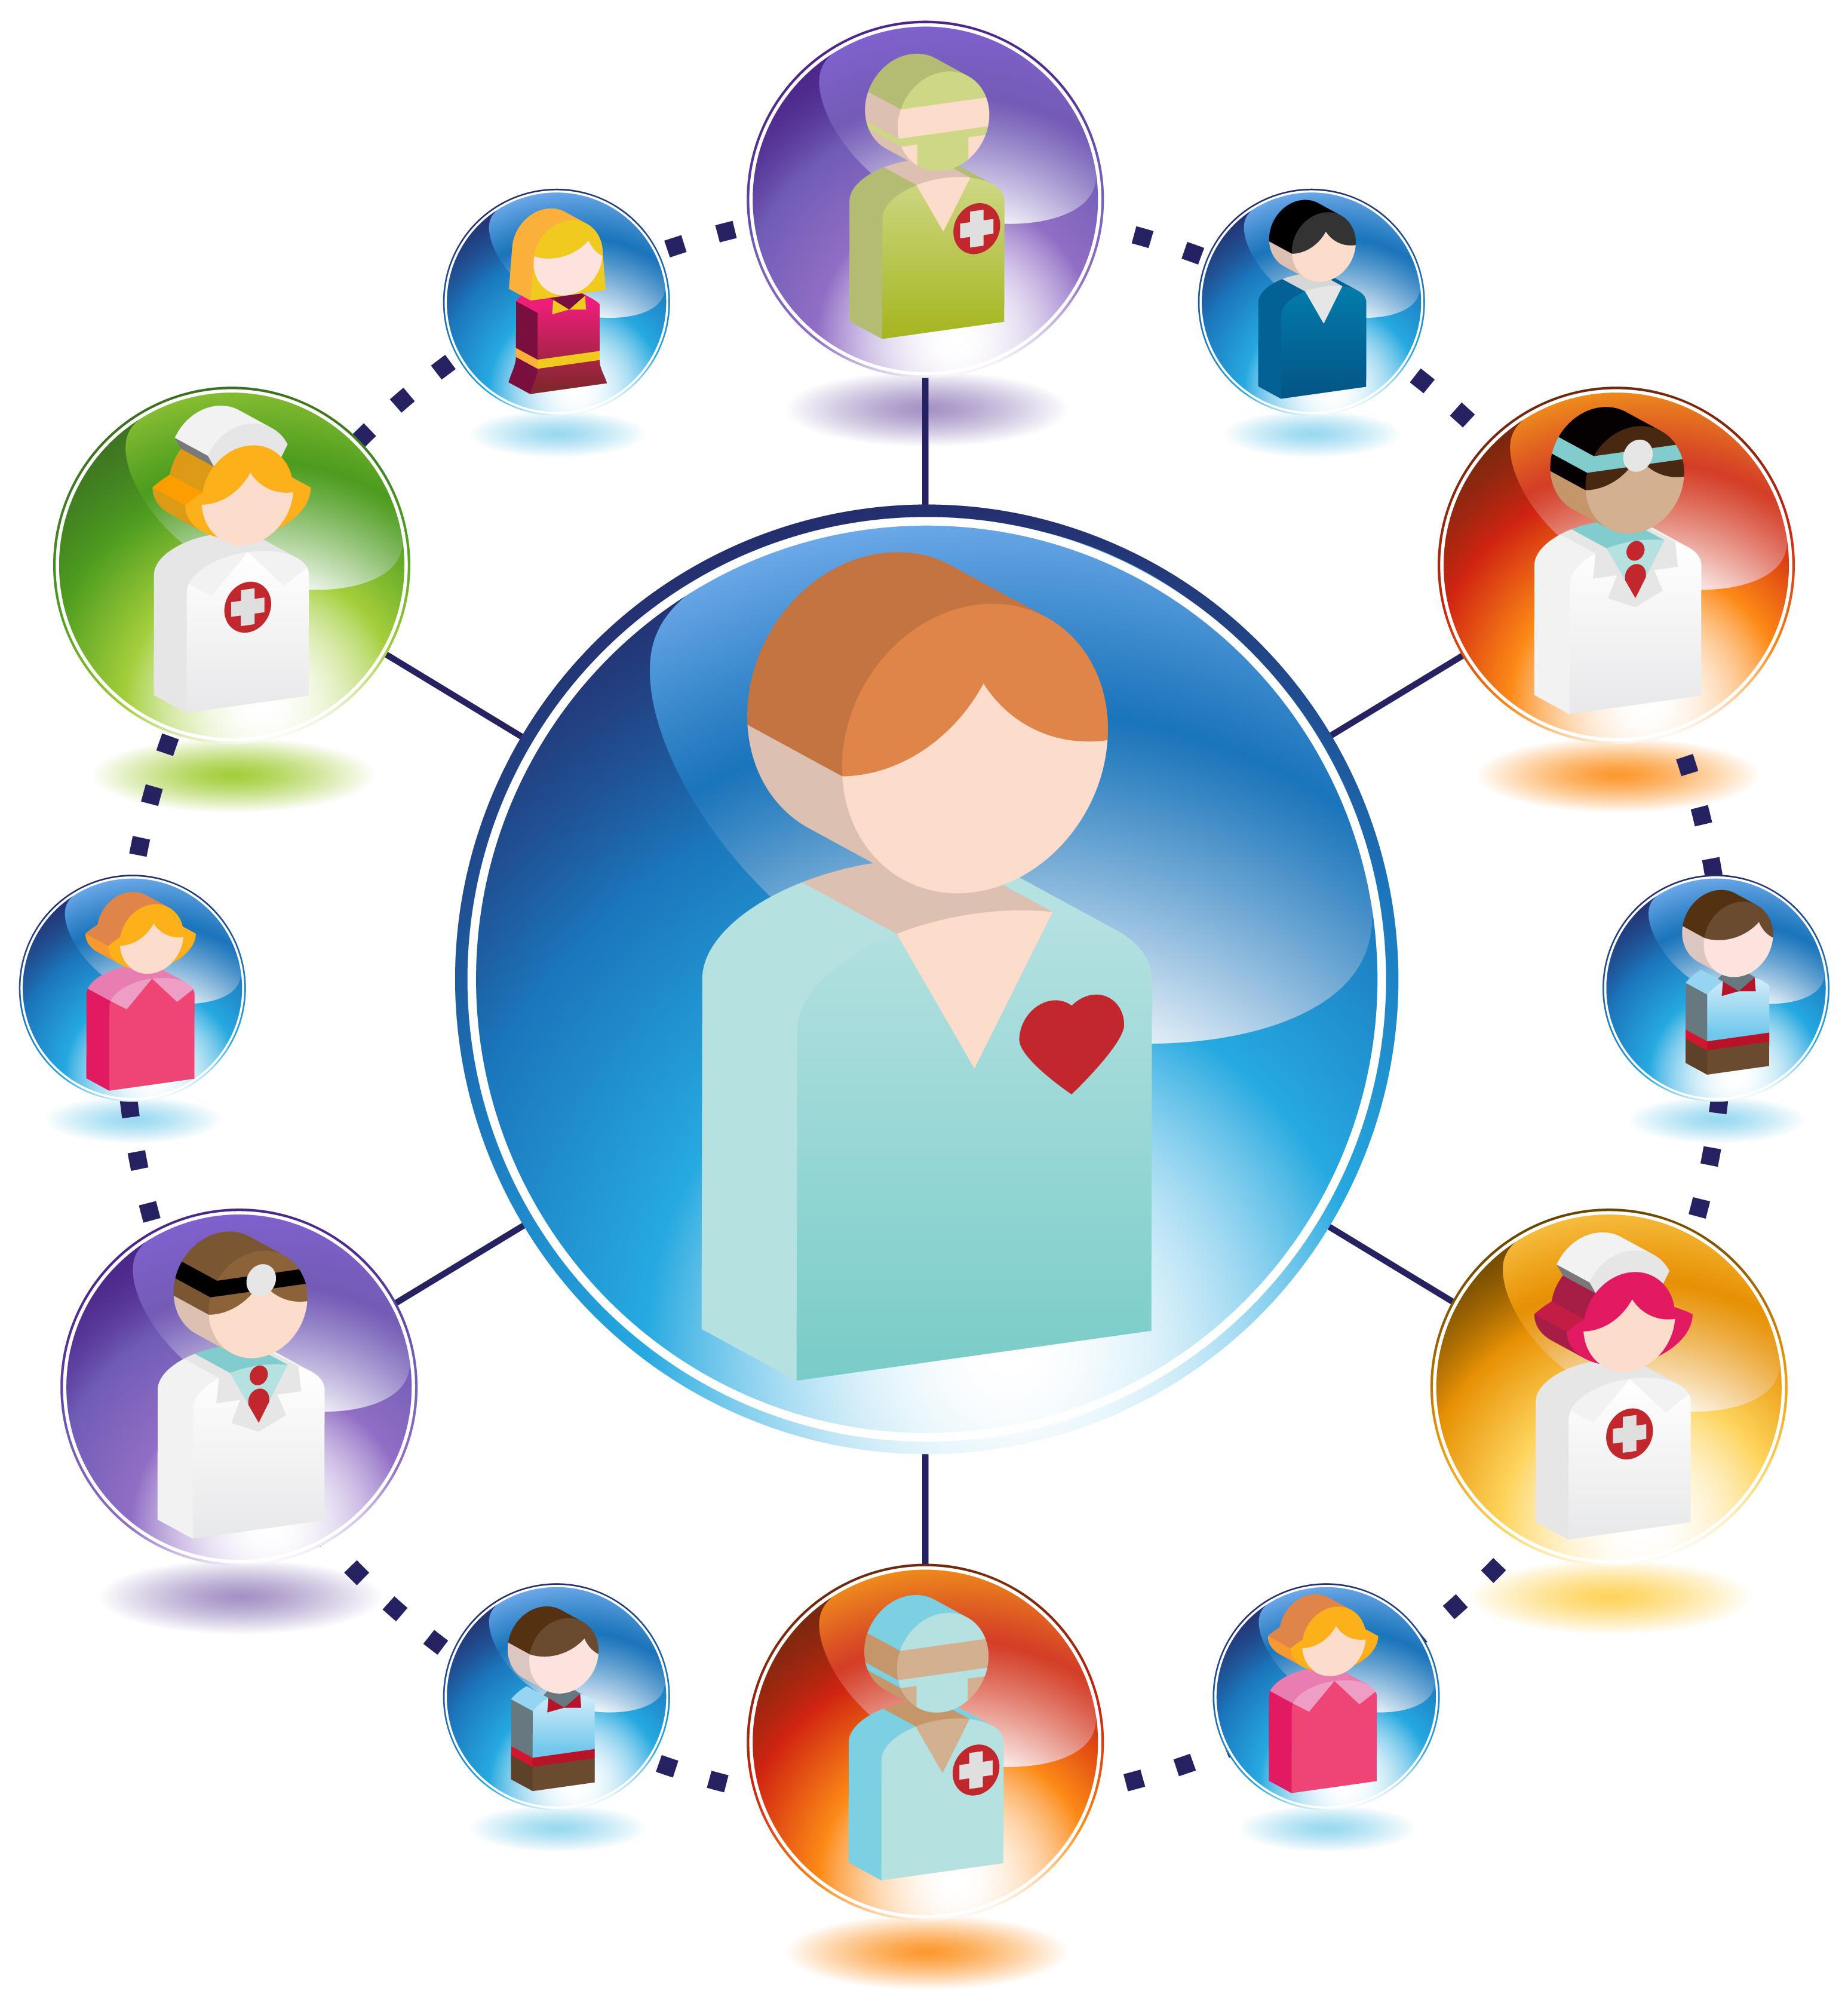 Health care clip art. Teamwork clipart healthcare teamwork